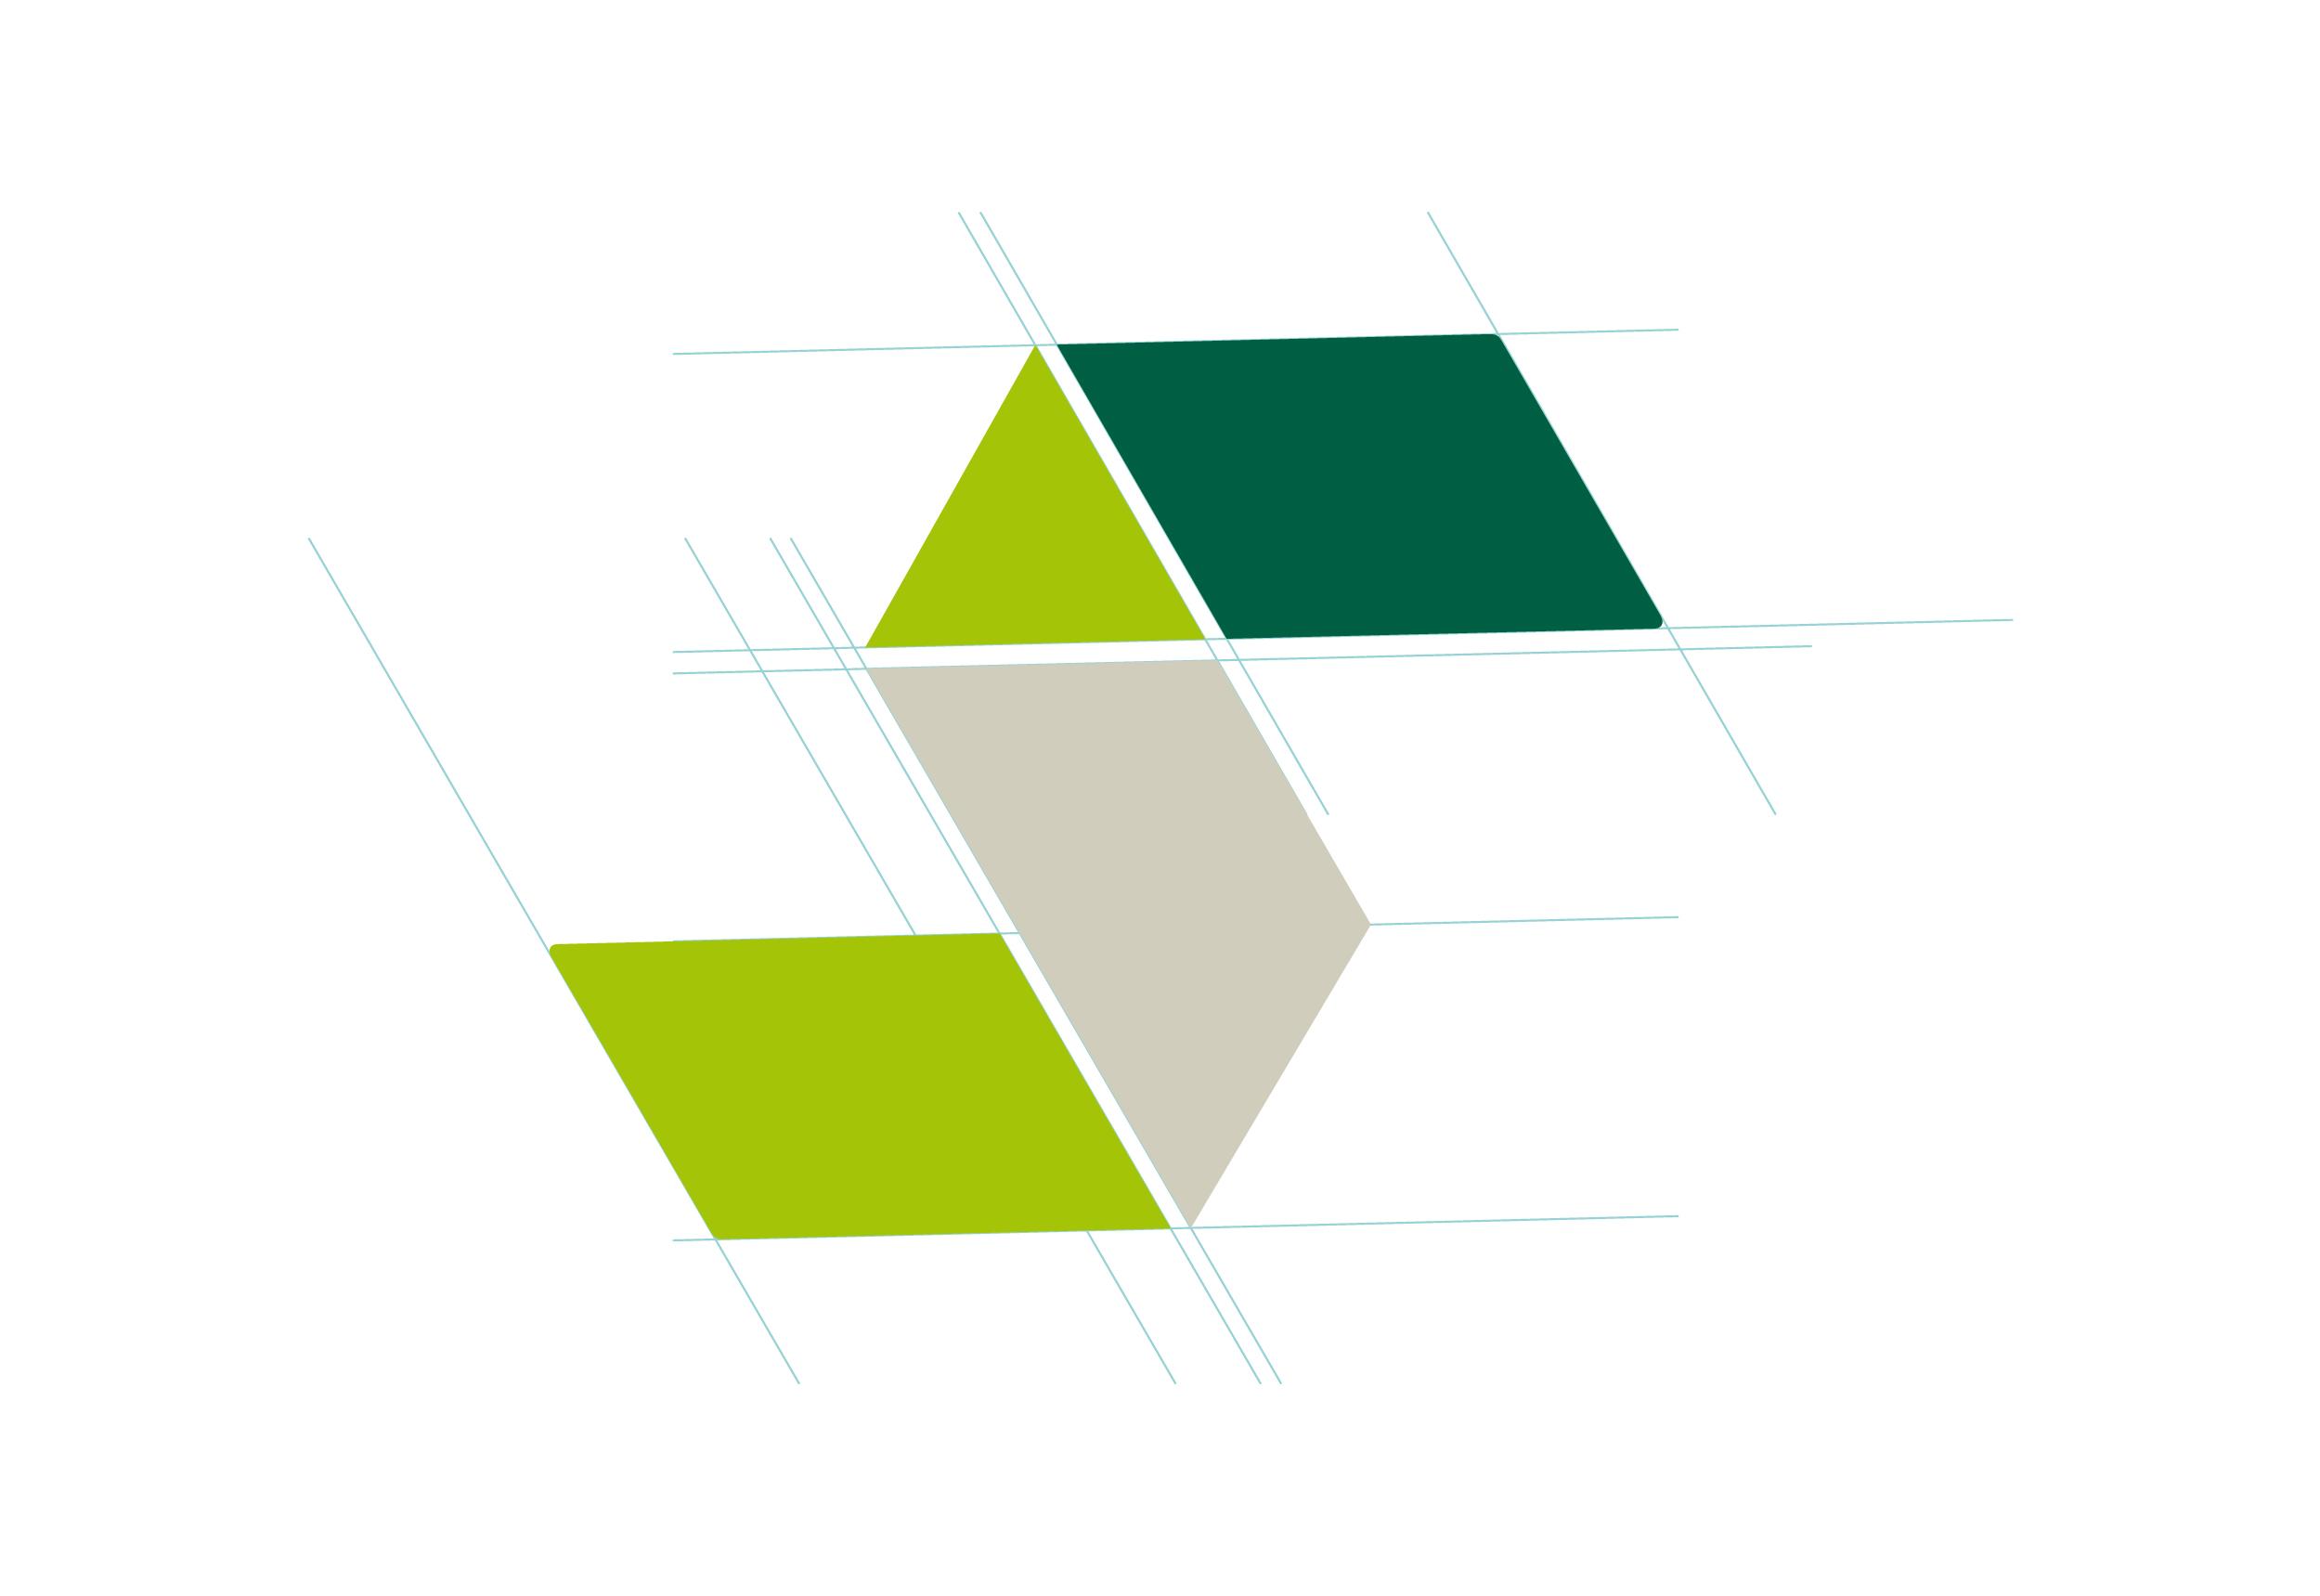 Franziska Schatz Grafik Design | Kommunikationsdesign | Editorial Design | Logo | Branding | Corporate Design | Identity | Werbung | Werbeagentur | Kaufbeuren | Allgäu, logo, corporate design, corporate identity, unternehmensgestaltung